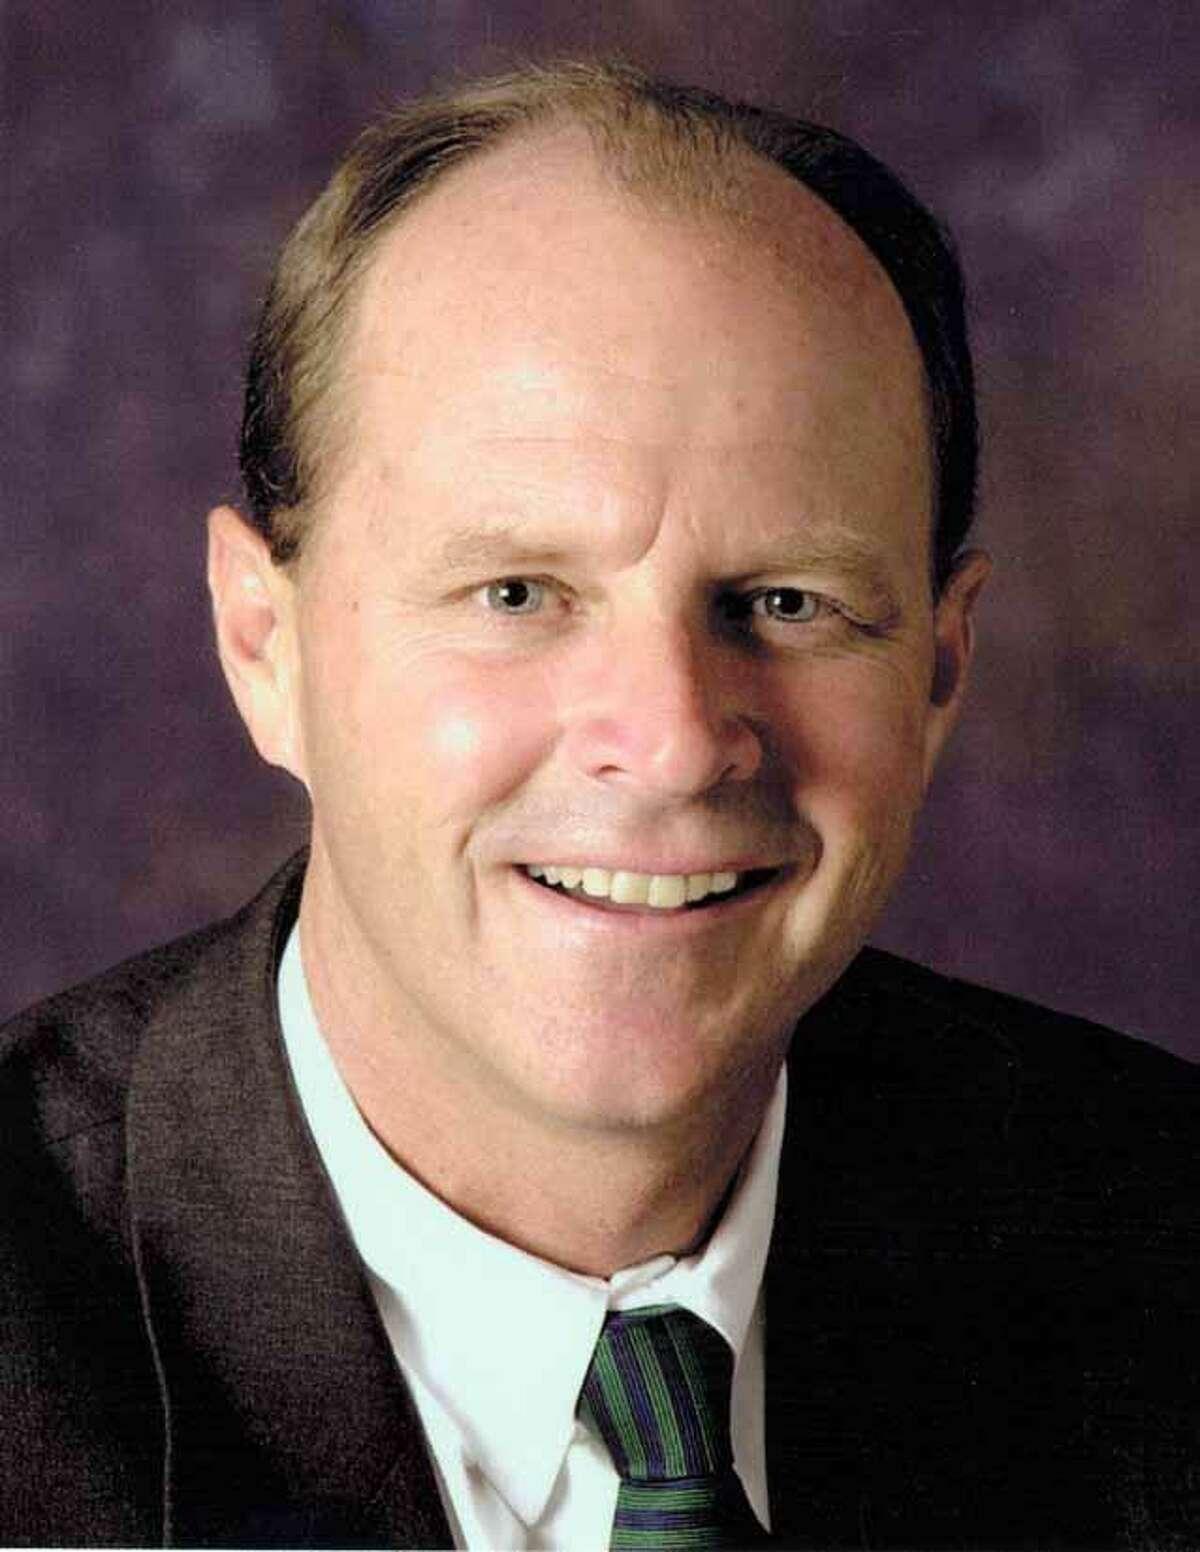 Michael Stoker, the administrator of EPA Region 9, in San Francisco